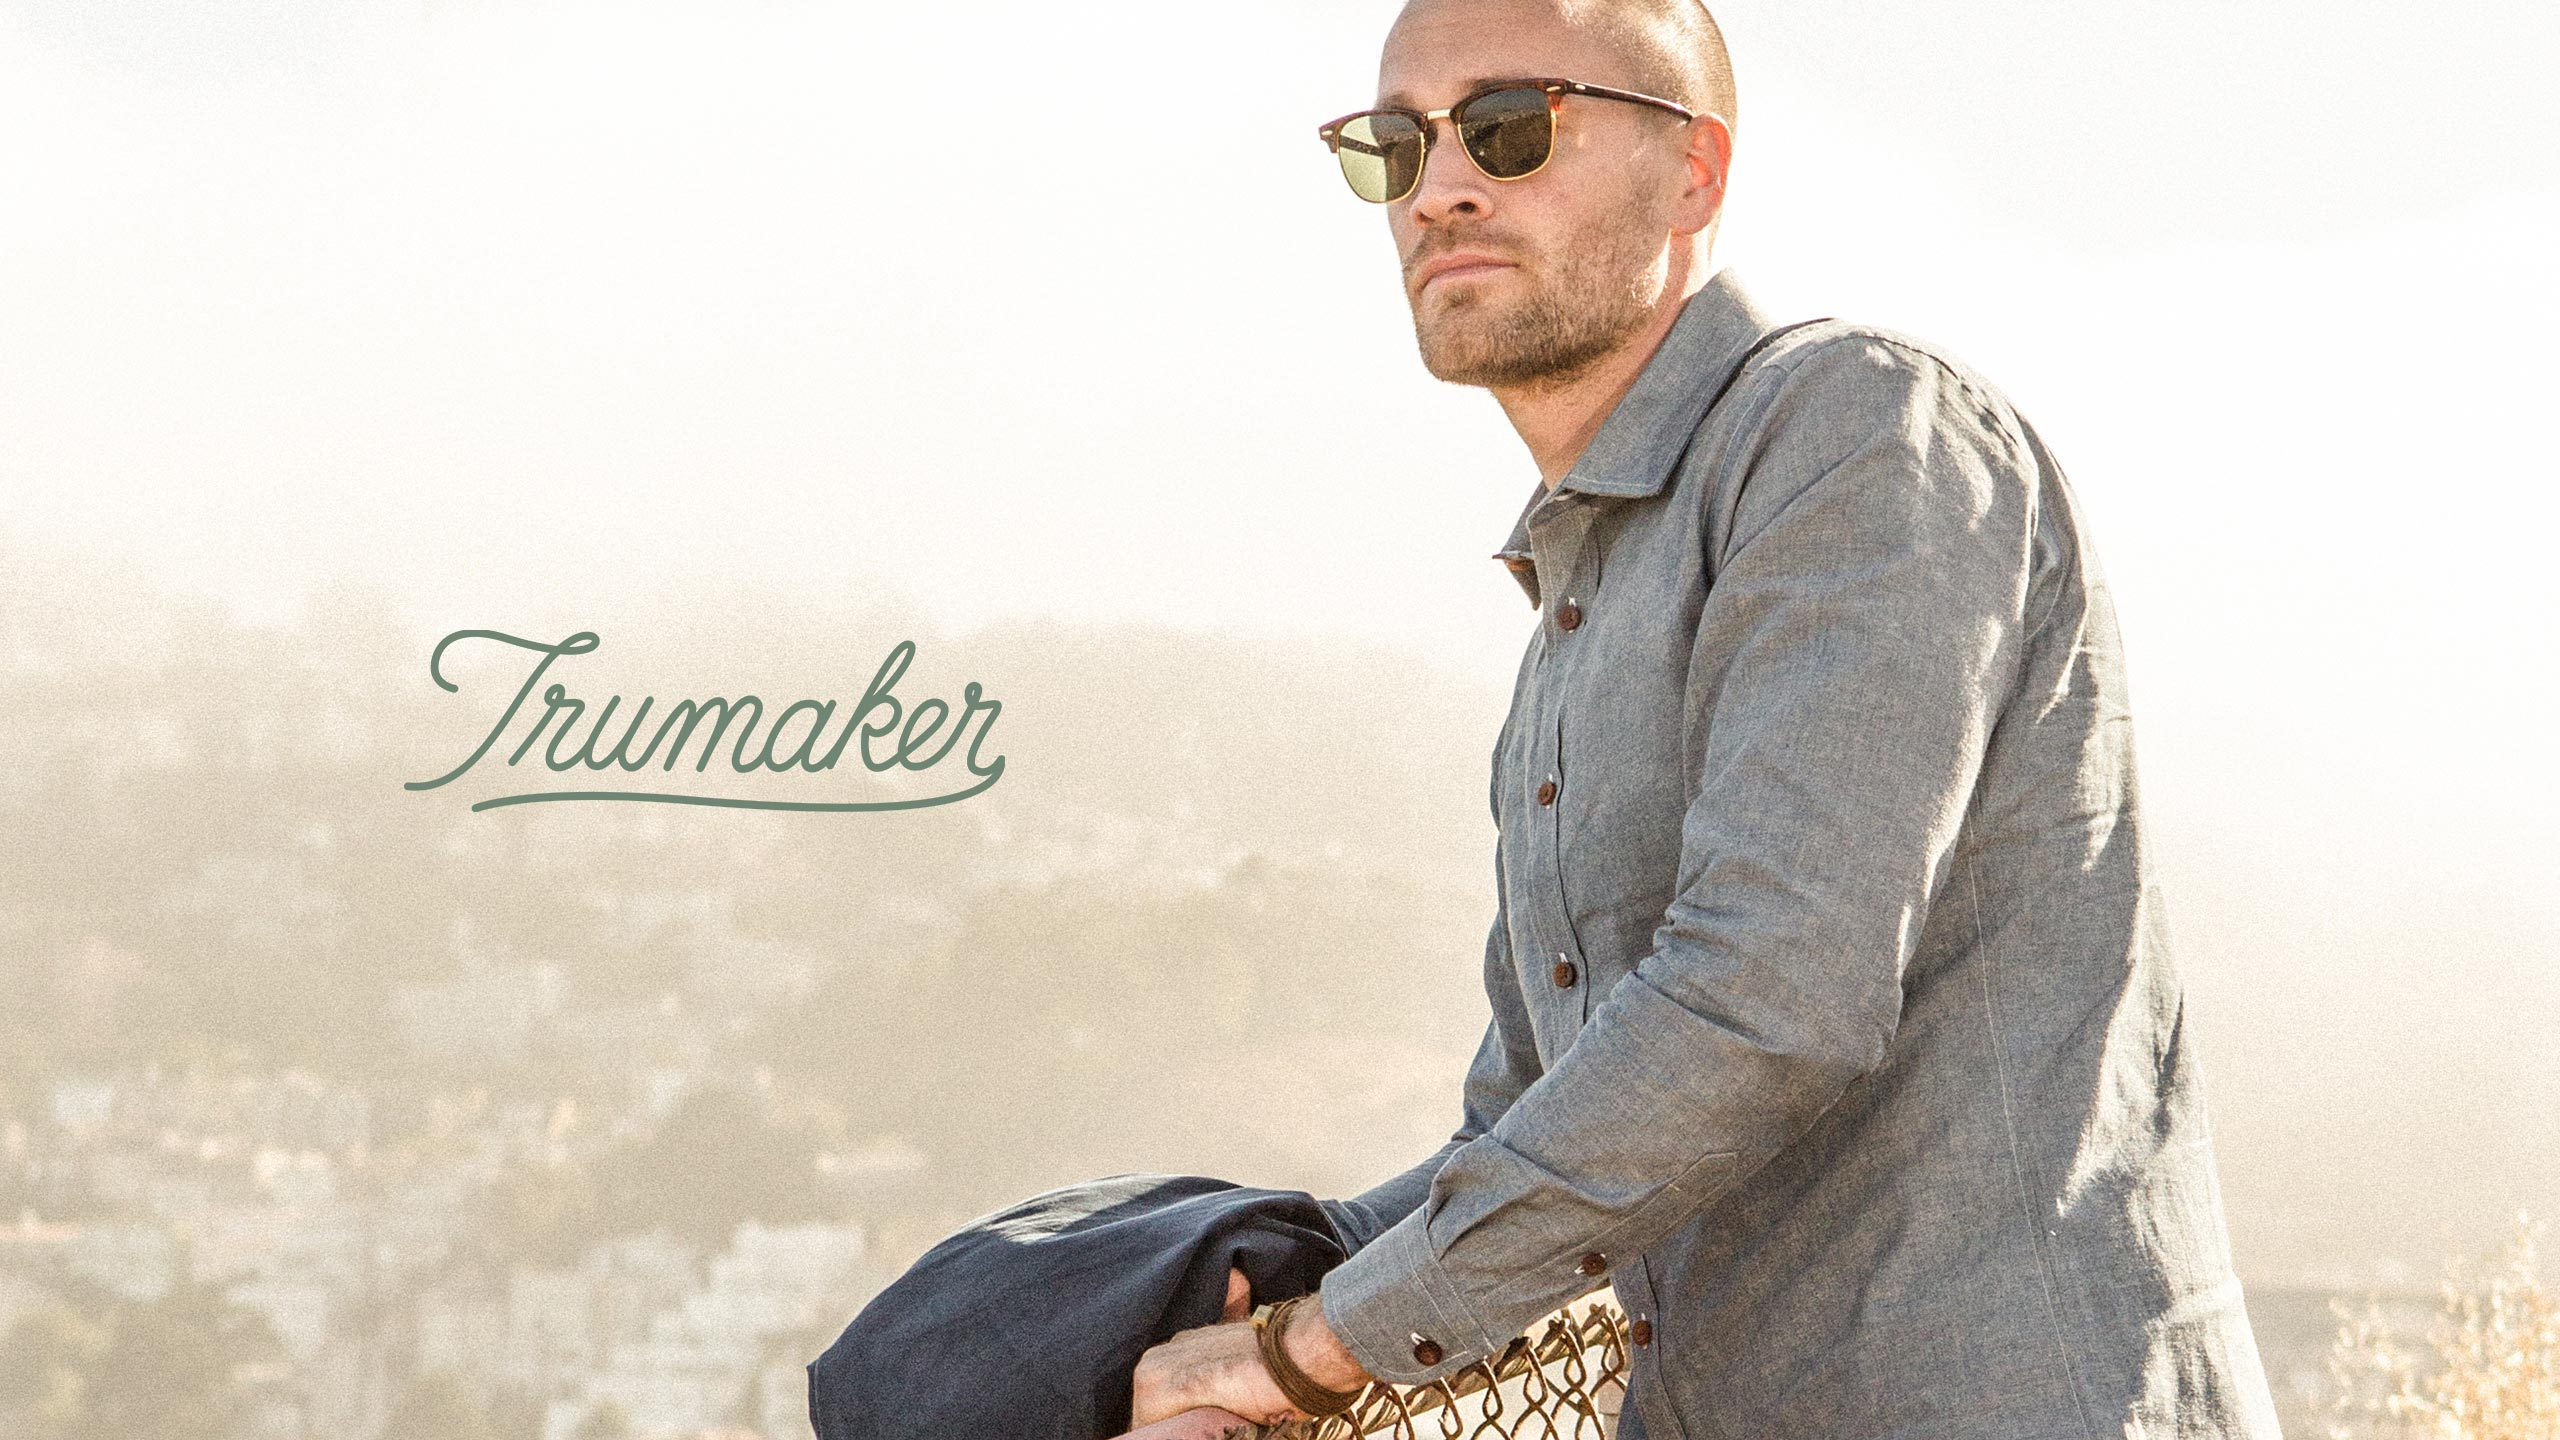 Trumaker